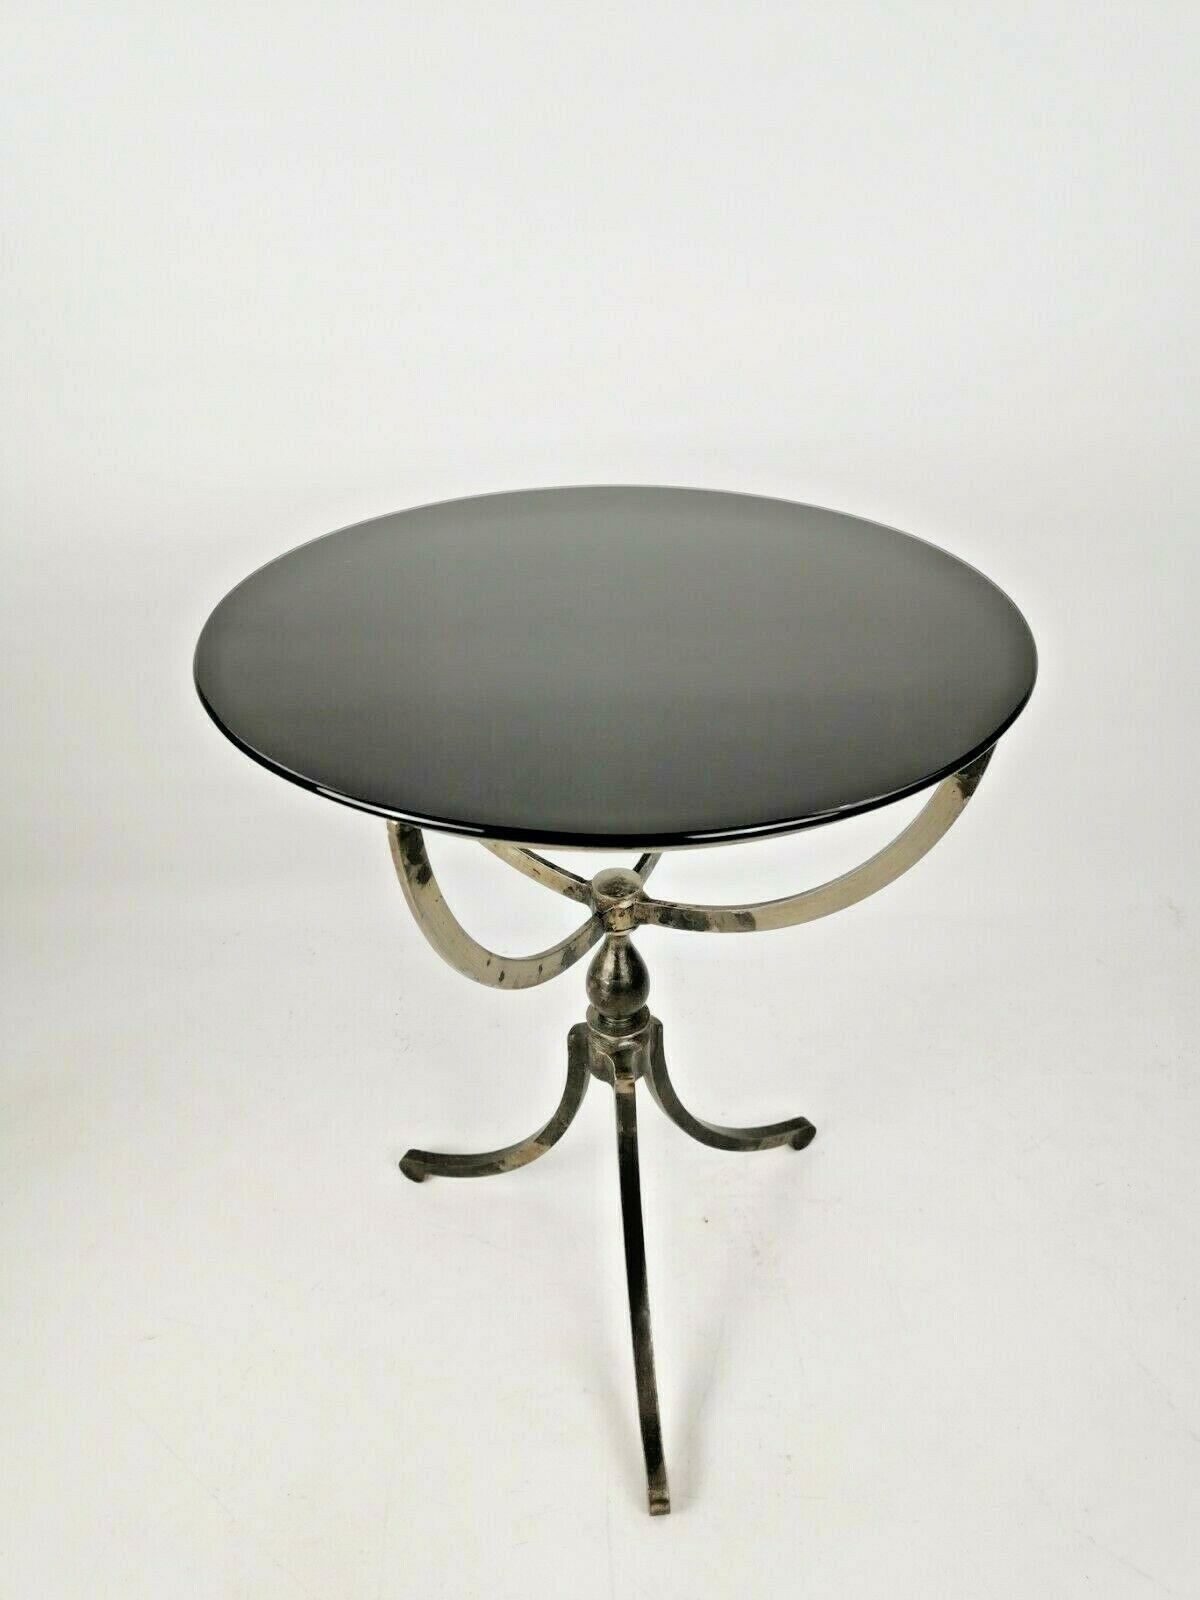 Vintage Antique Round Black Glass Side Table With Metal Legs Vintage Vinterior